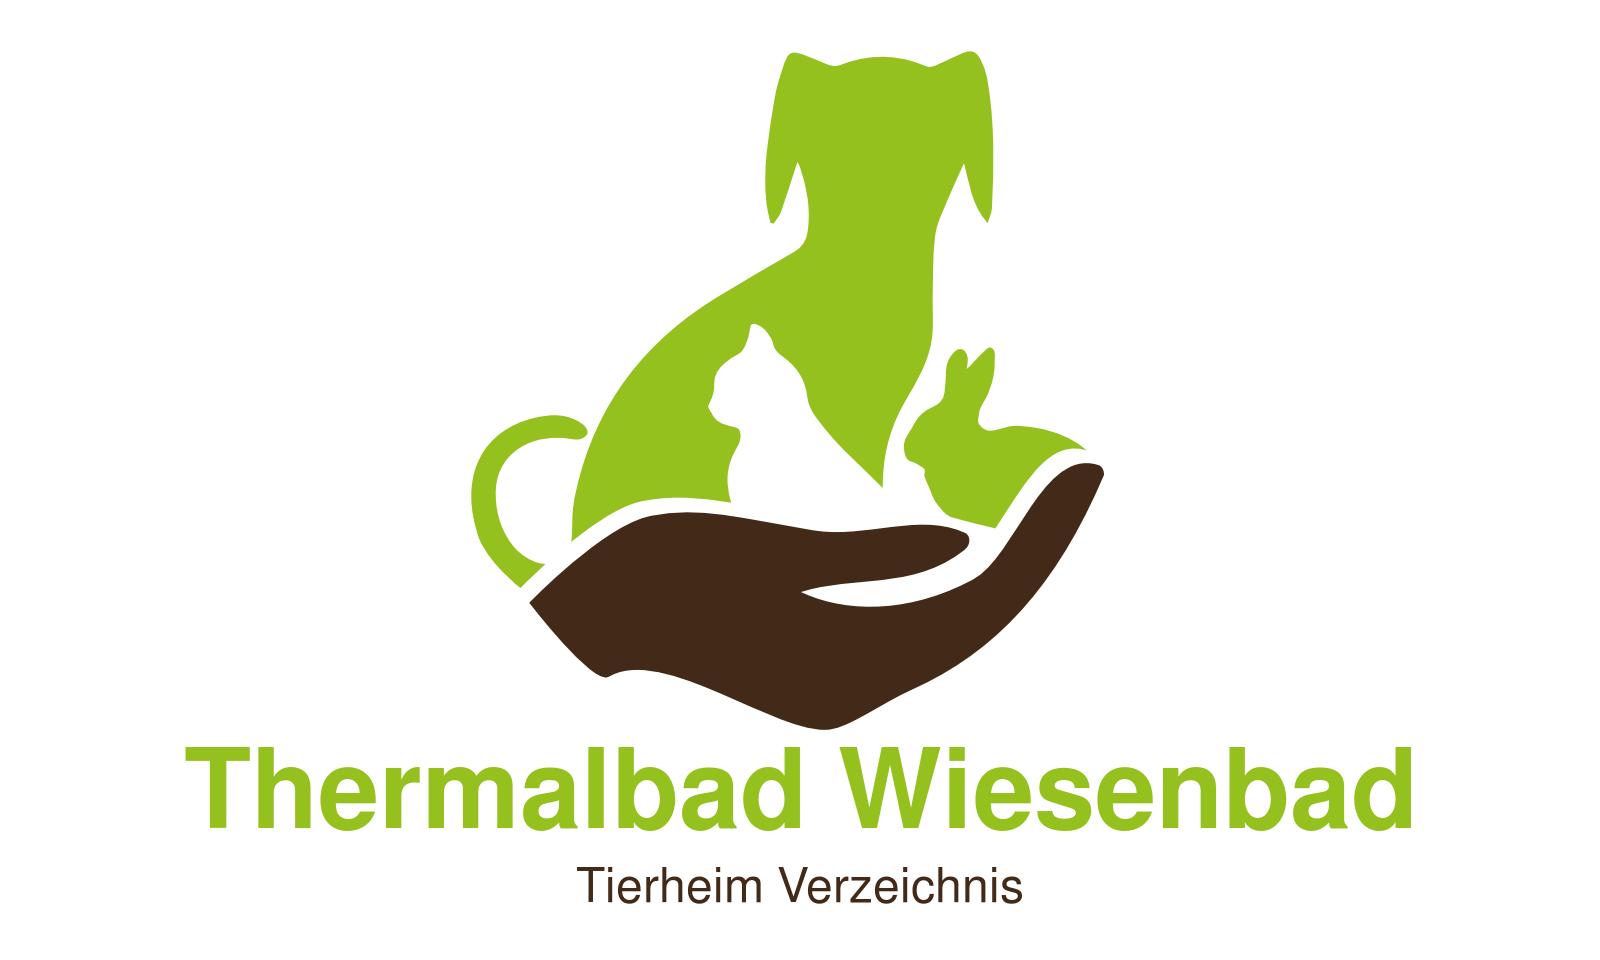 Tierheim Thermalbad Wiesenbad